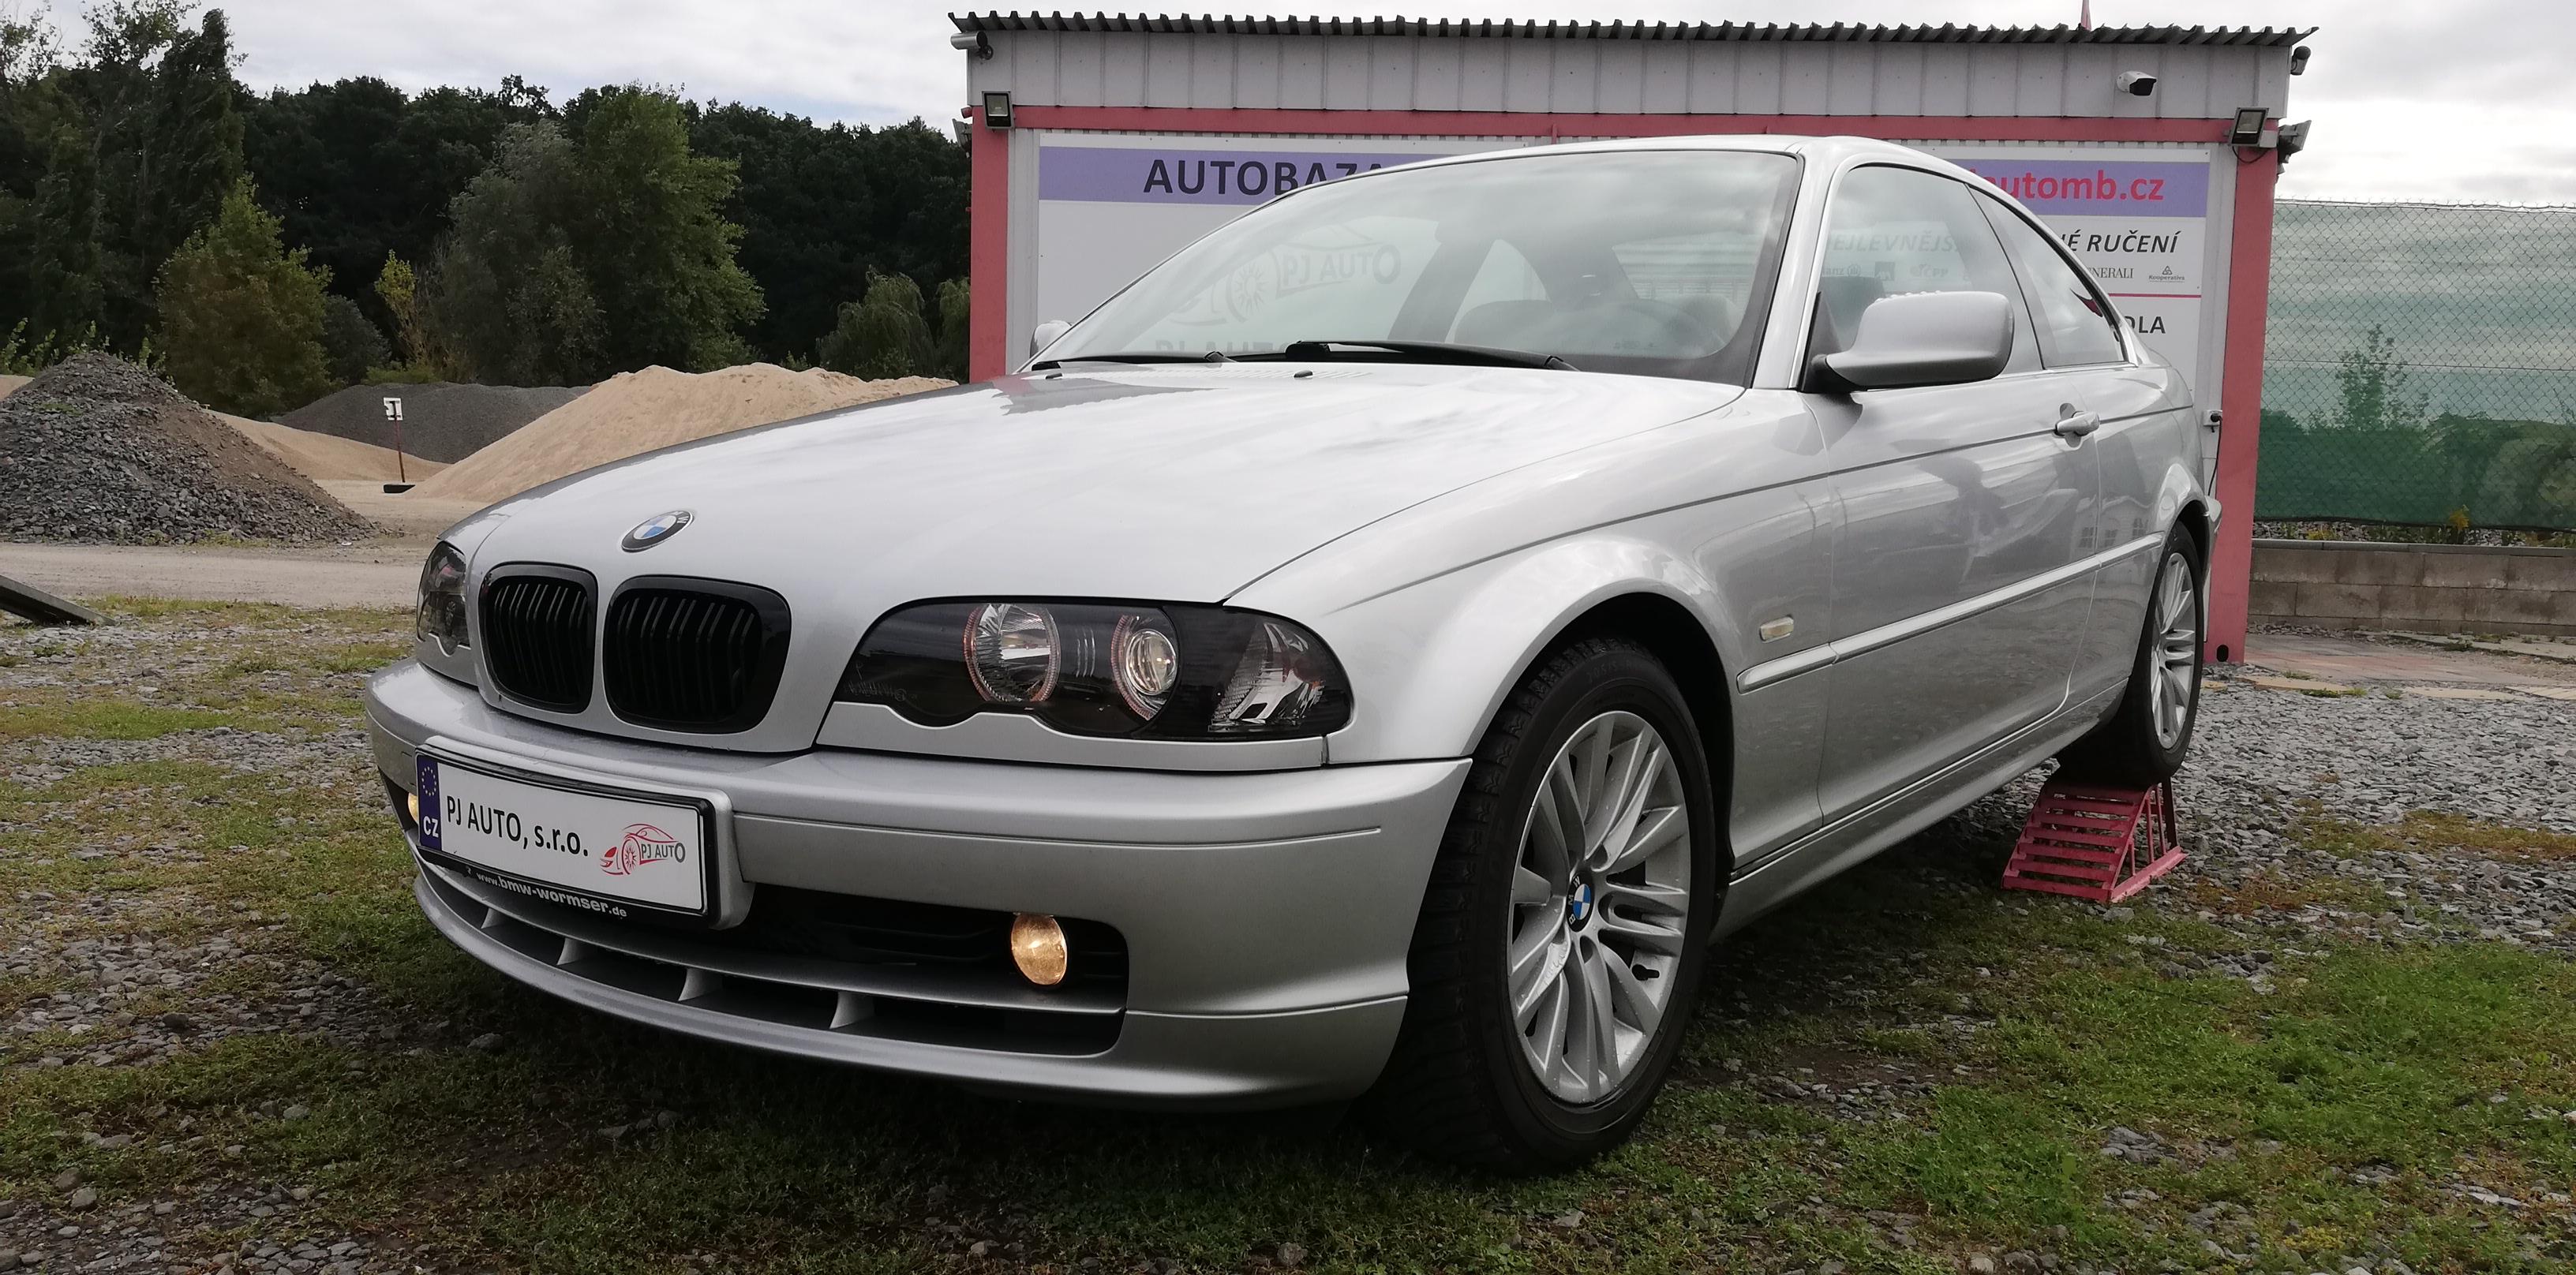 BMW 323i Ci 125kW E46,Temp,AAC,ALU,Android,Top